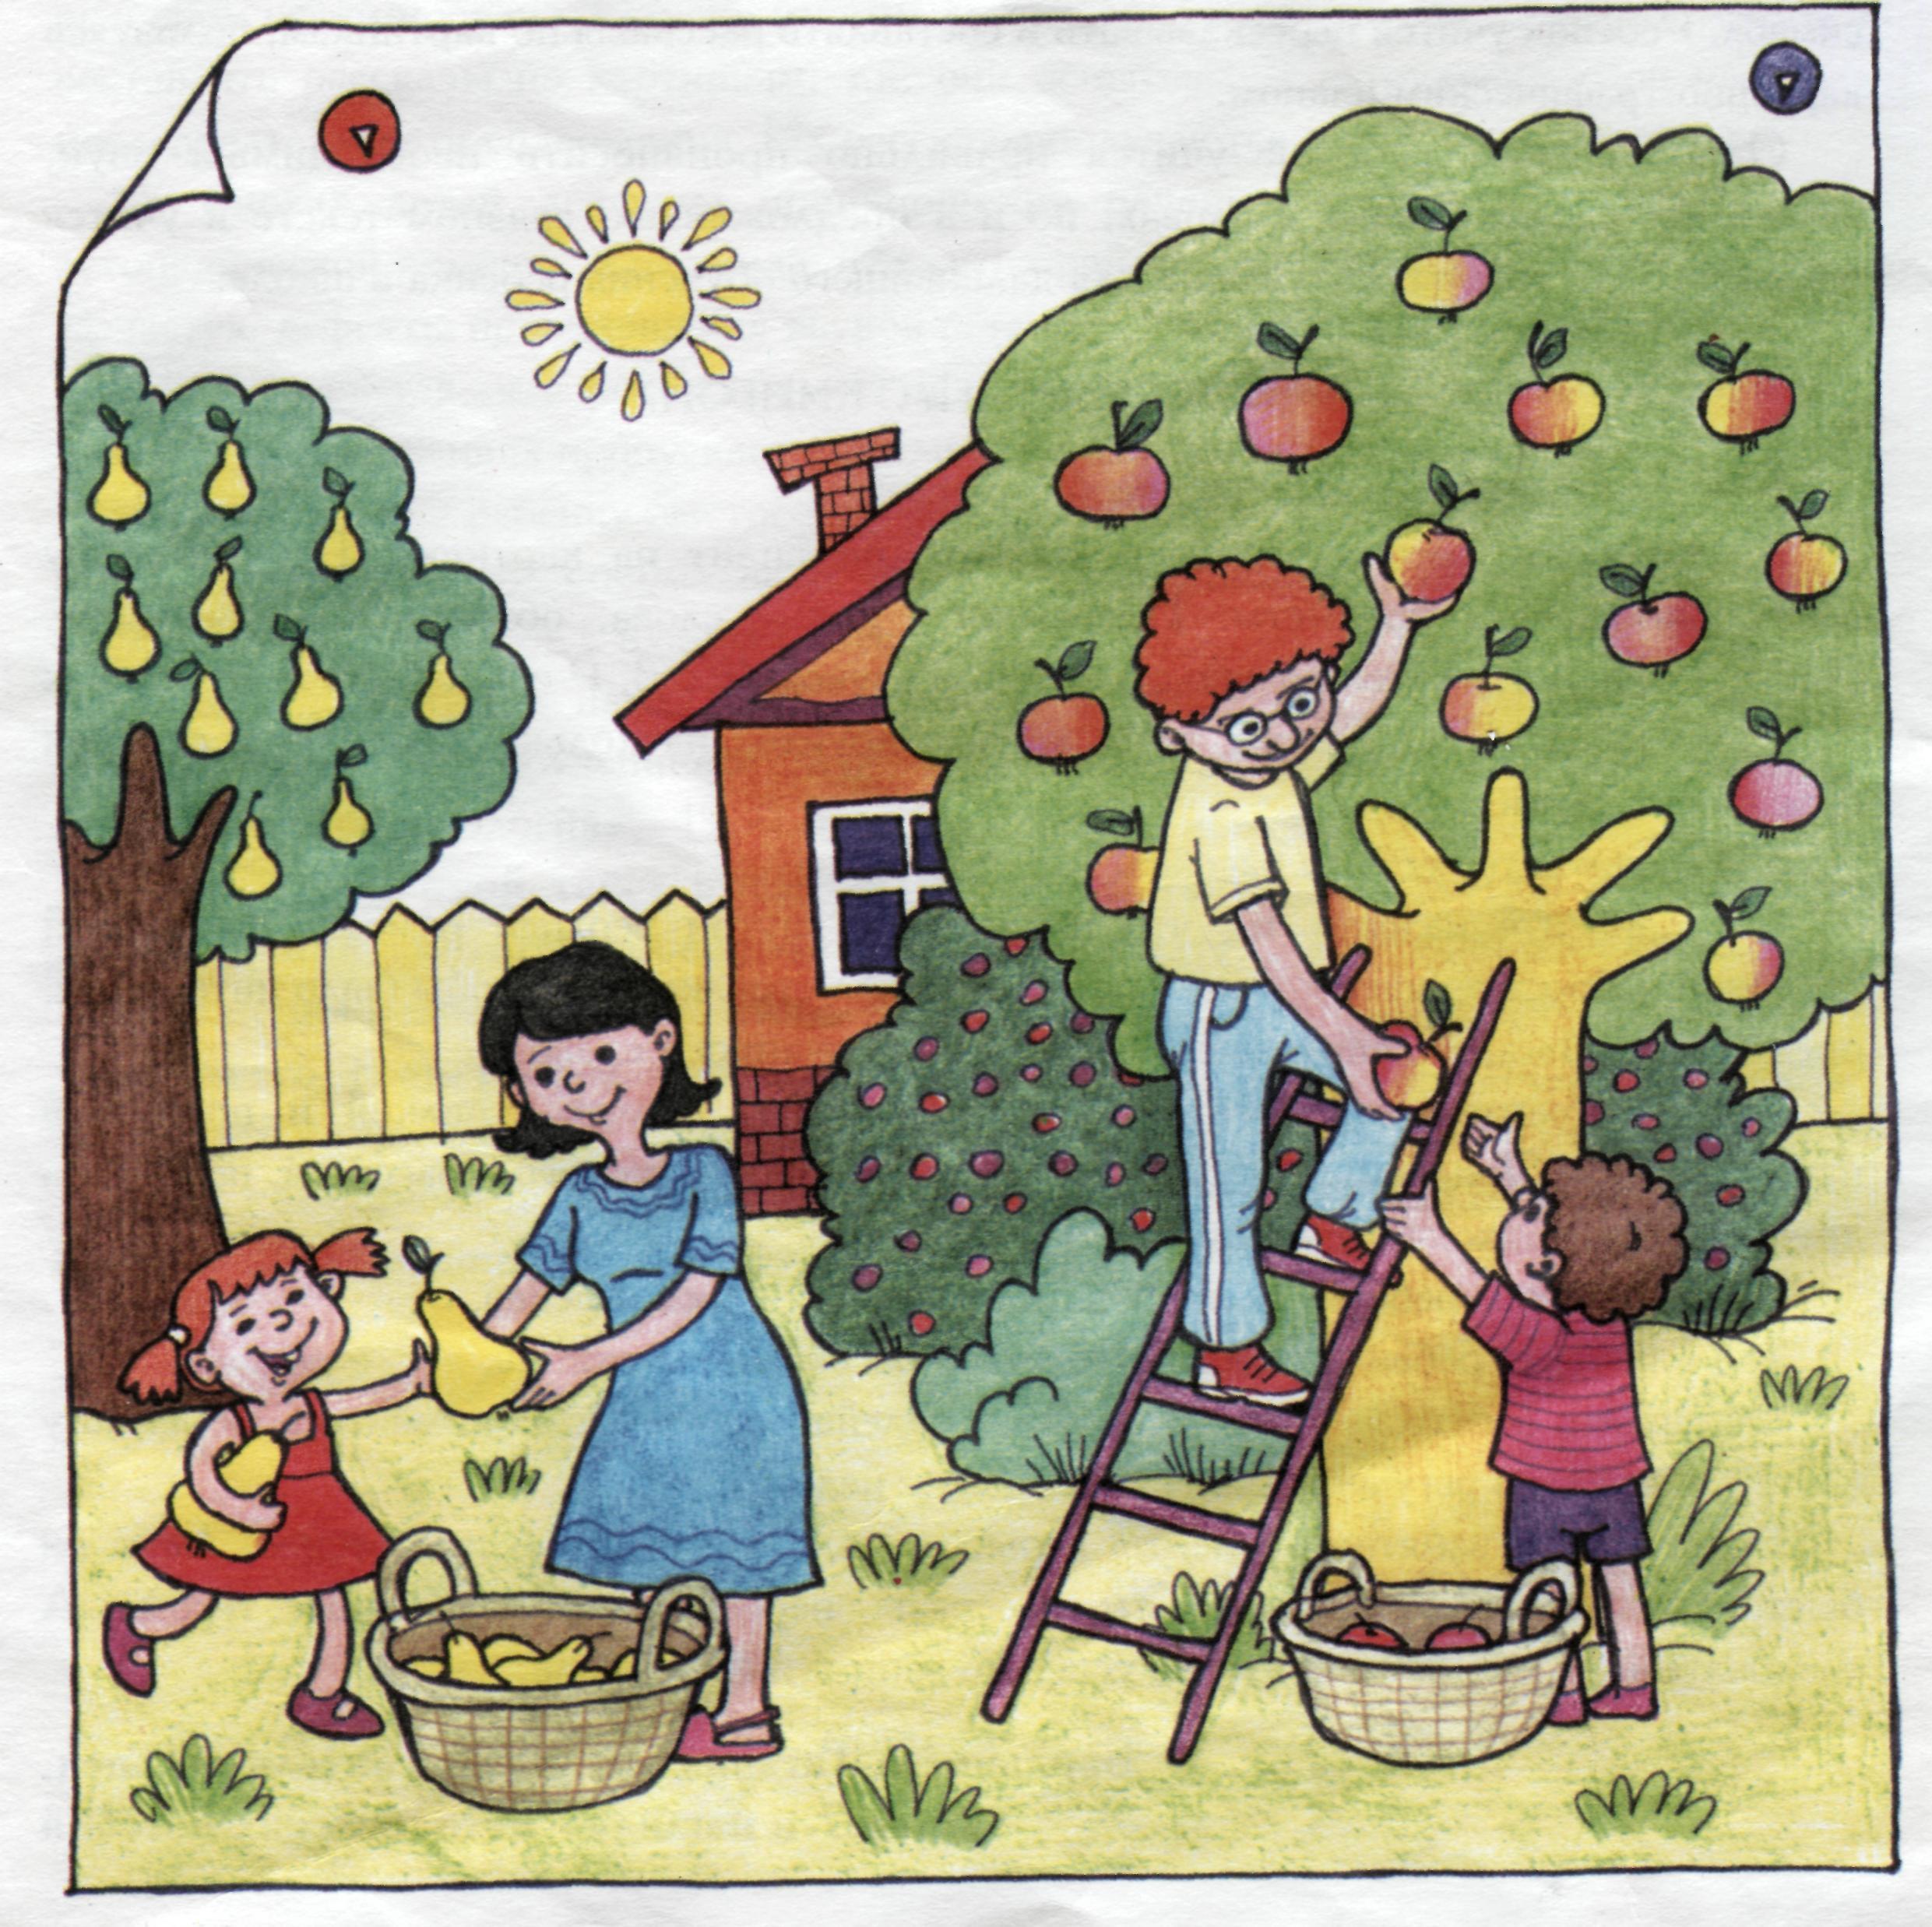 Картинка гербова домик малыша